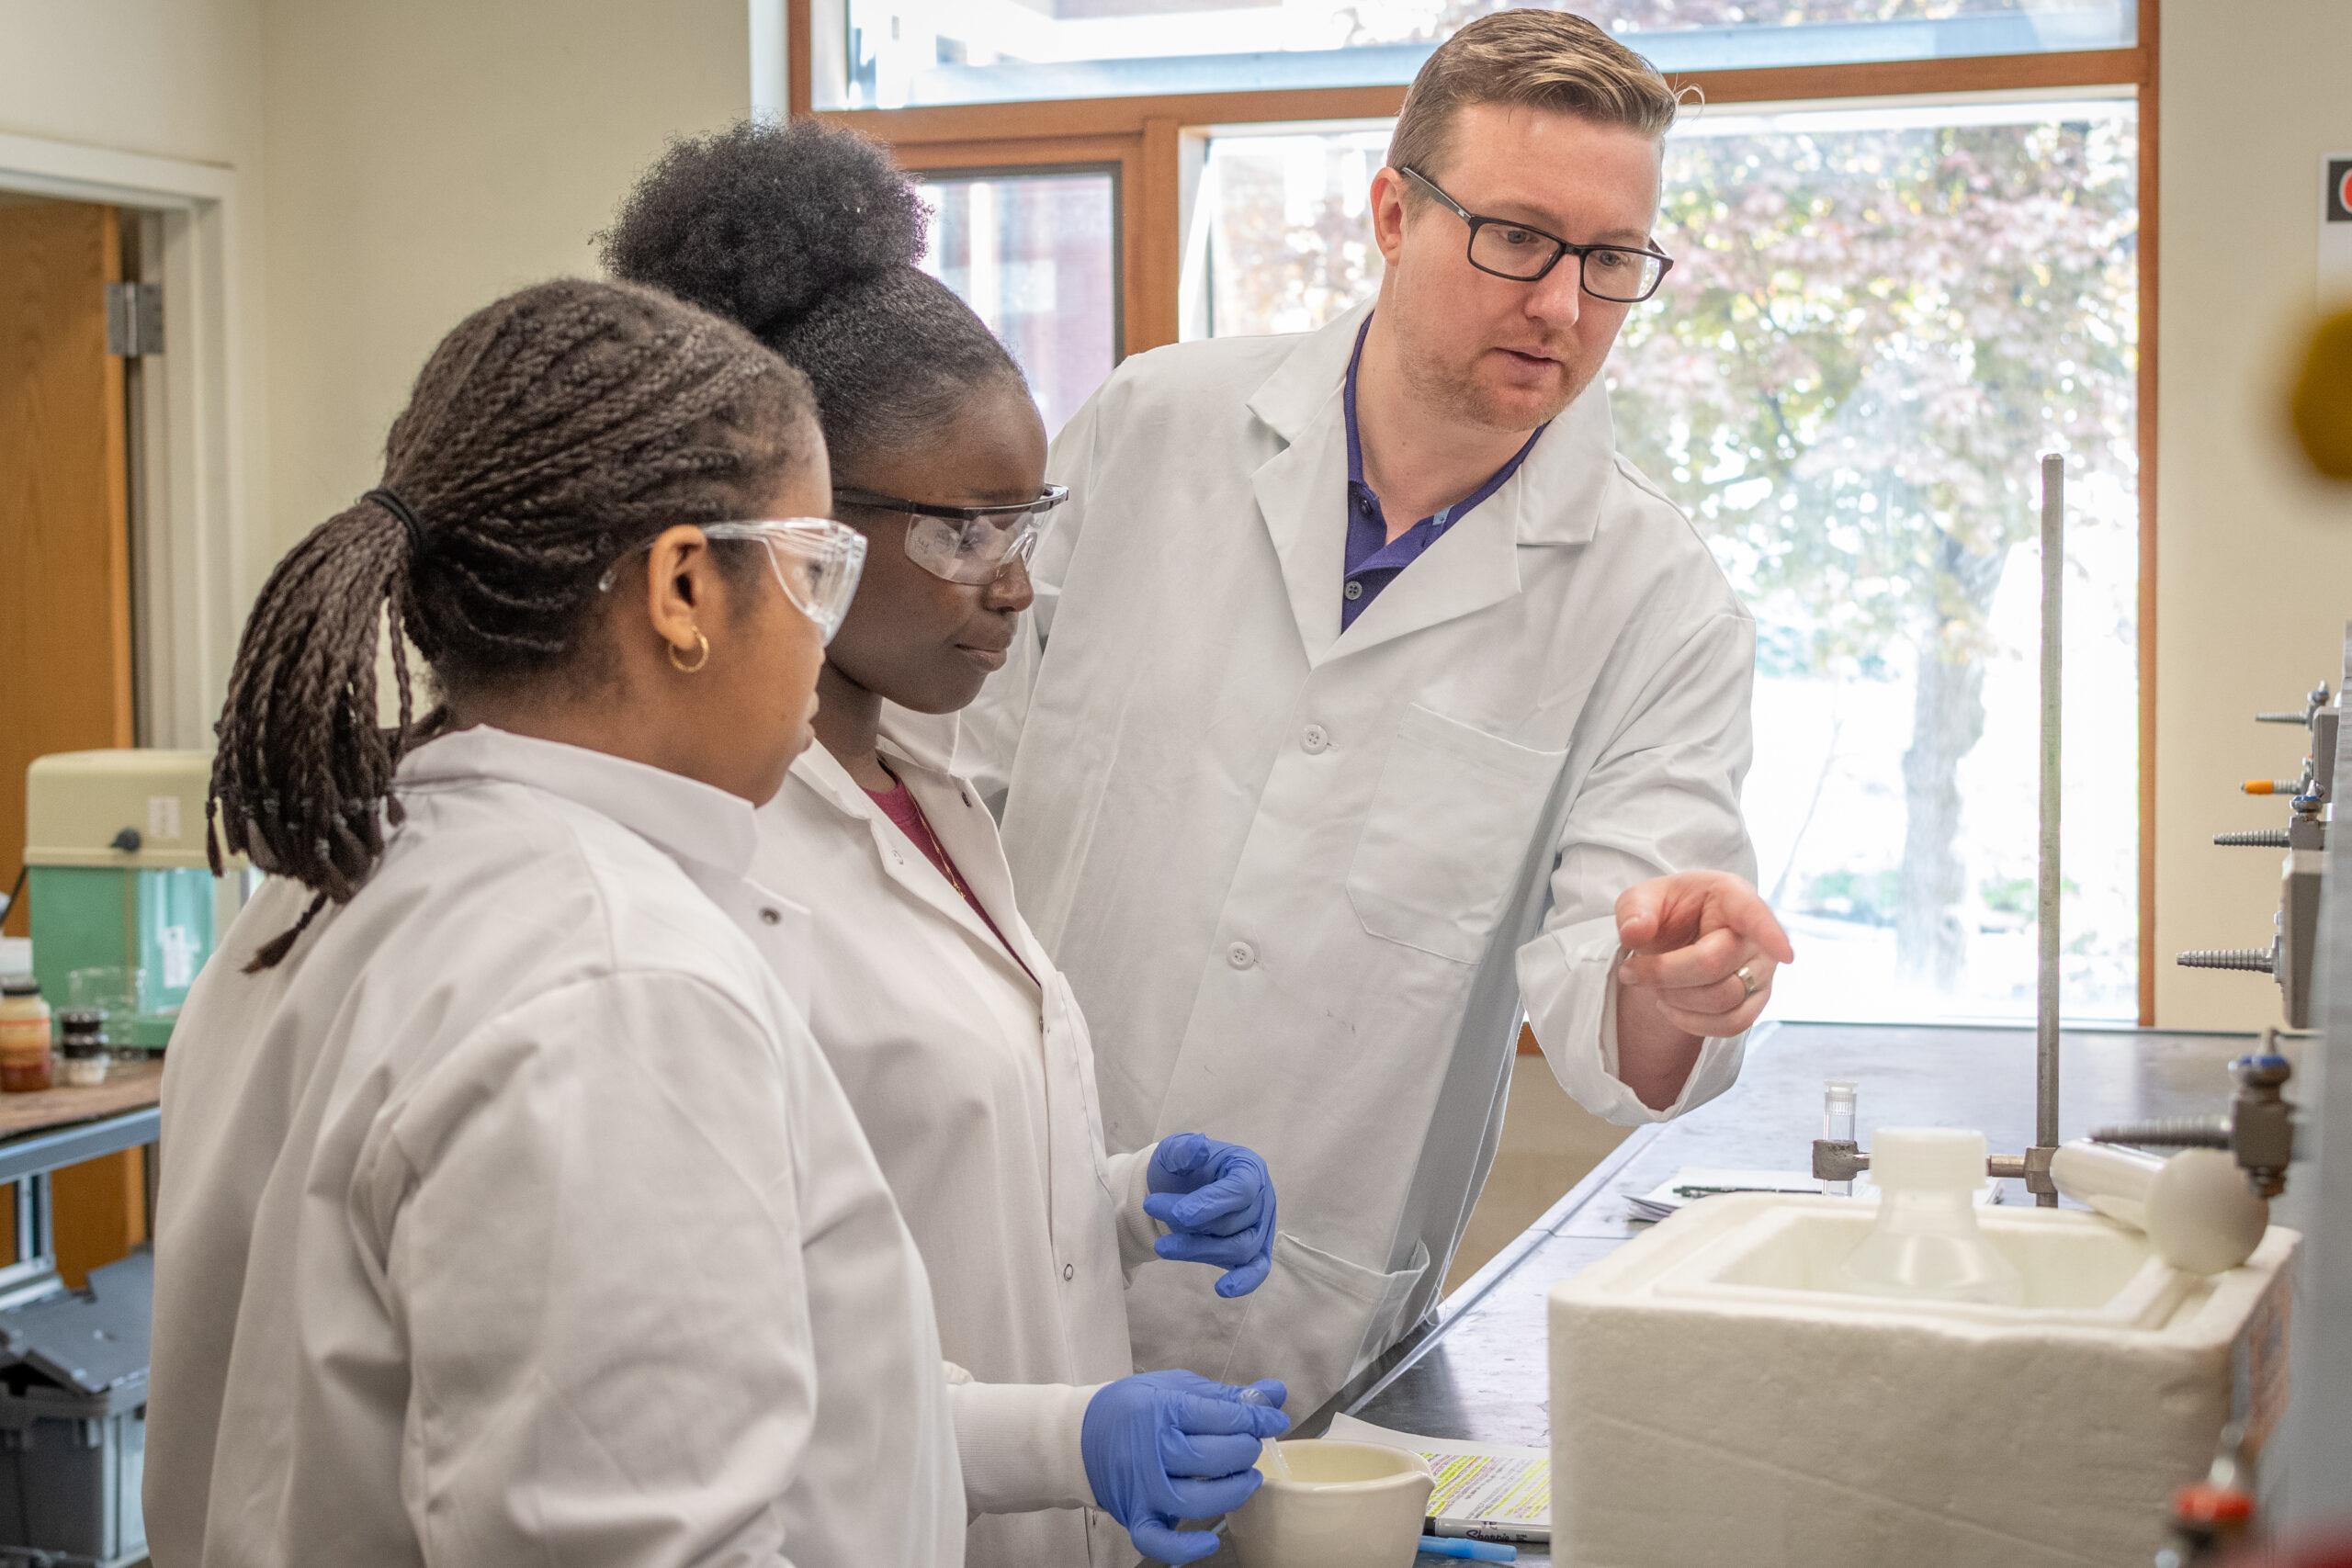 Don spratt with high school students in lab